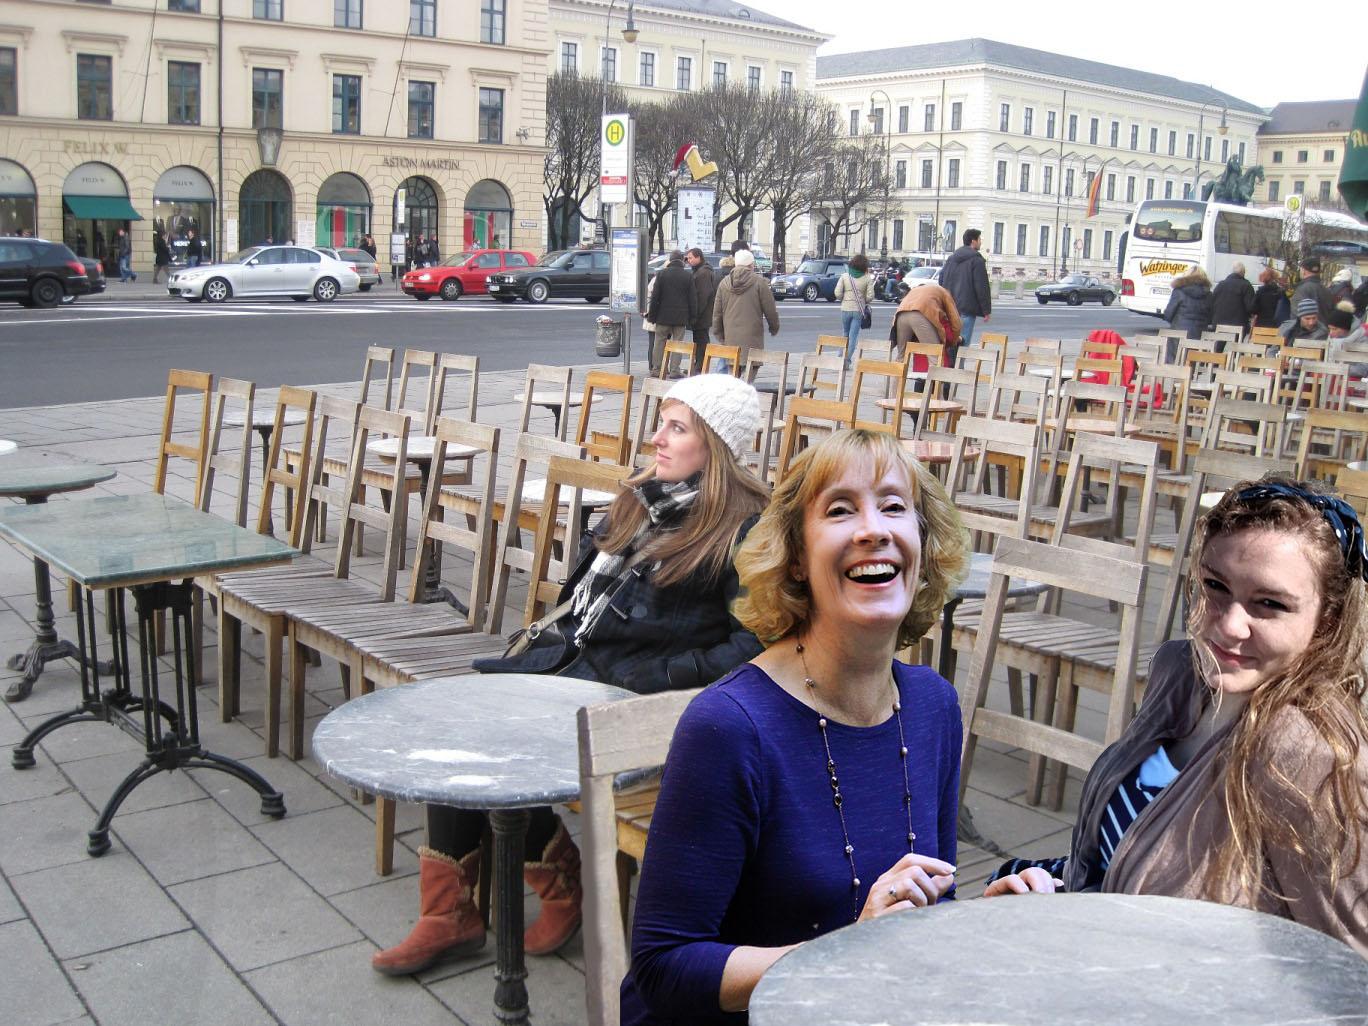 Morgan Tarpley Smith at the Odeonsplatz in Munich (left)—with travel buddy Molly Elizabeth (right) and Sarah Sundin added virtually (Photo courtesy of Morgan Tarpley Smith)